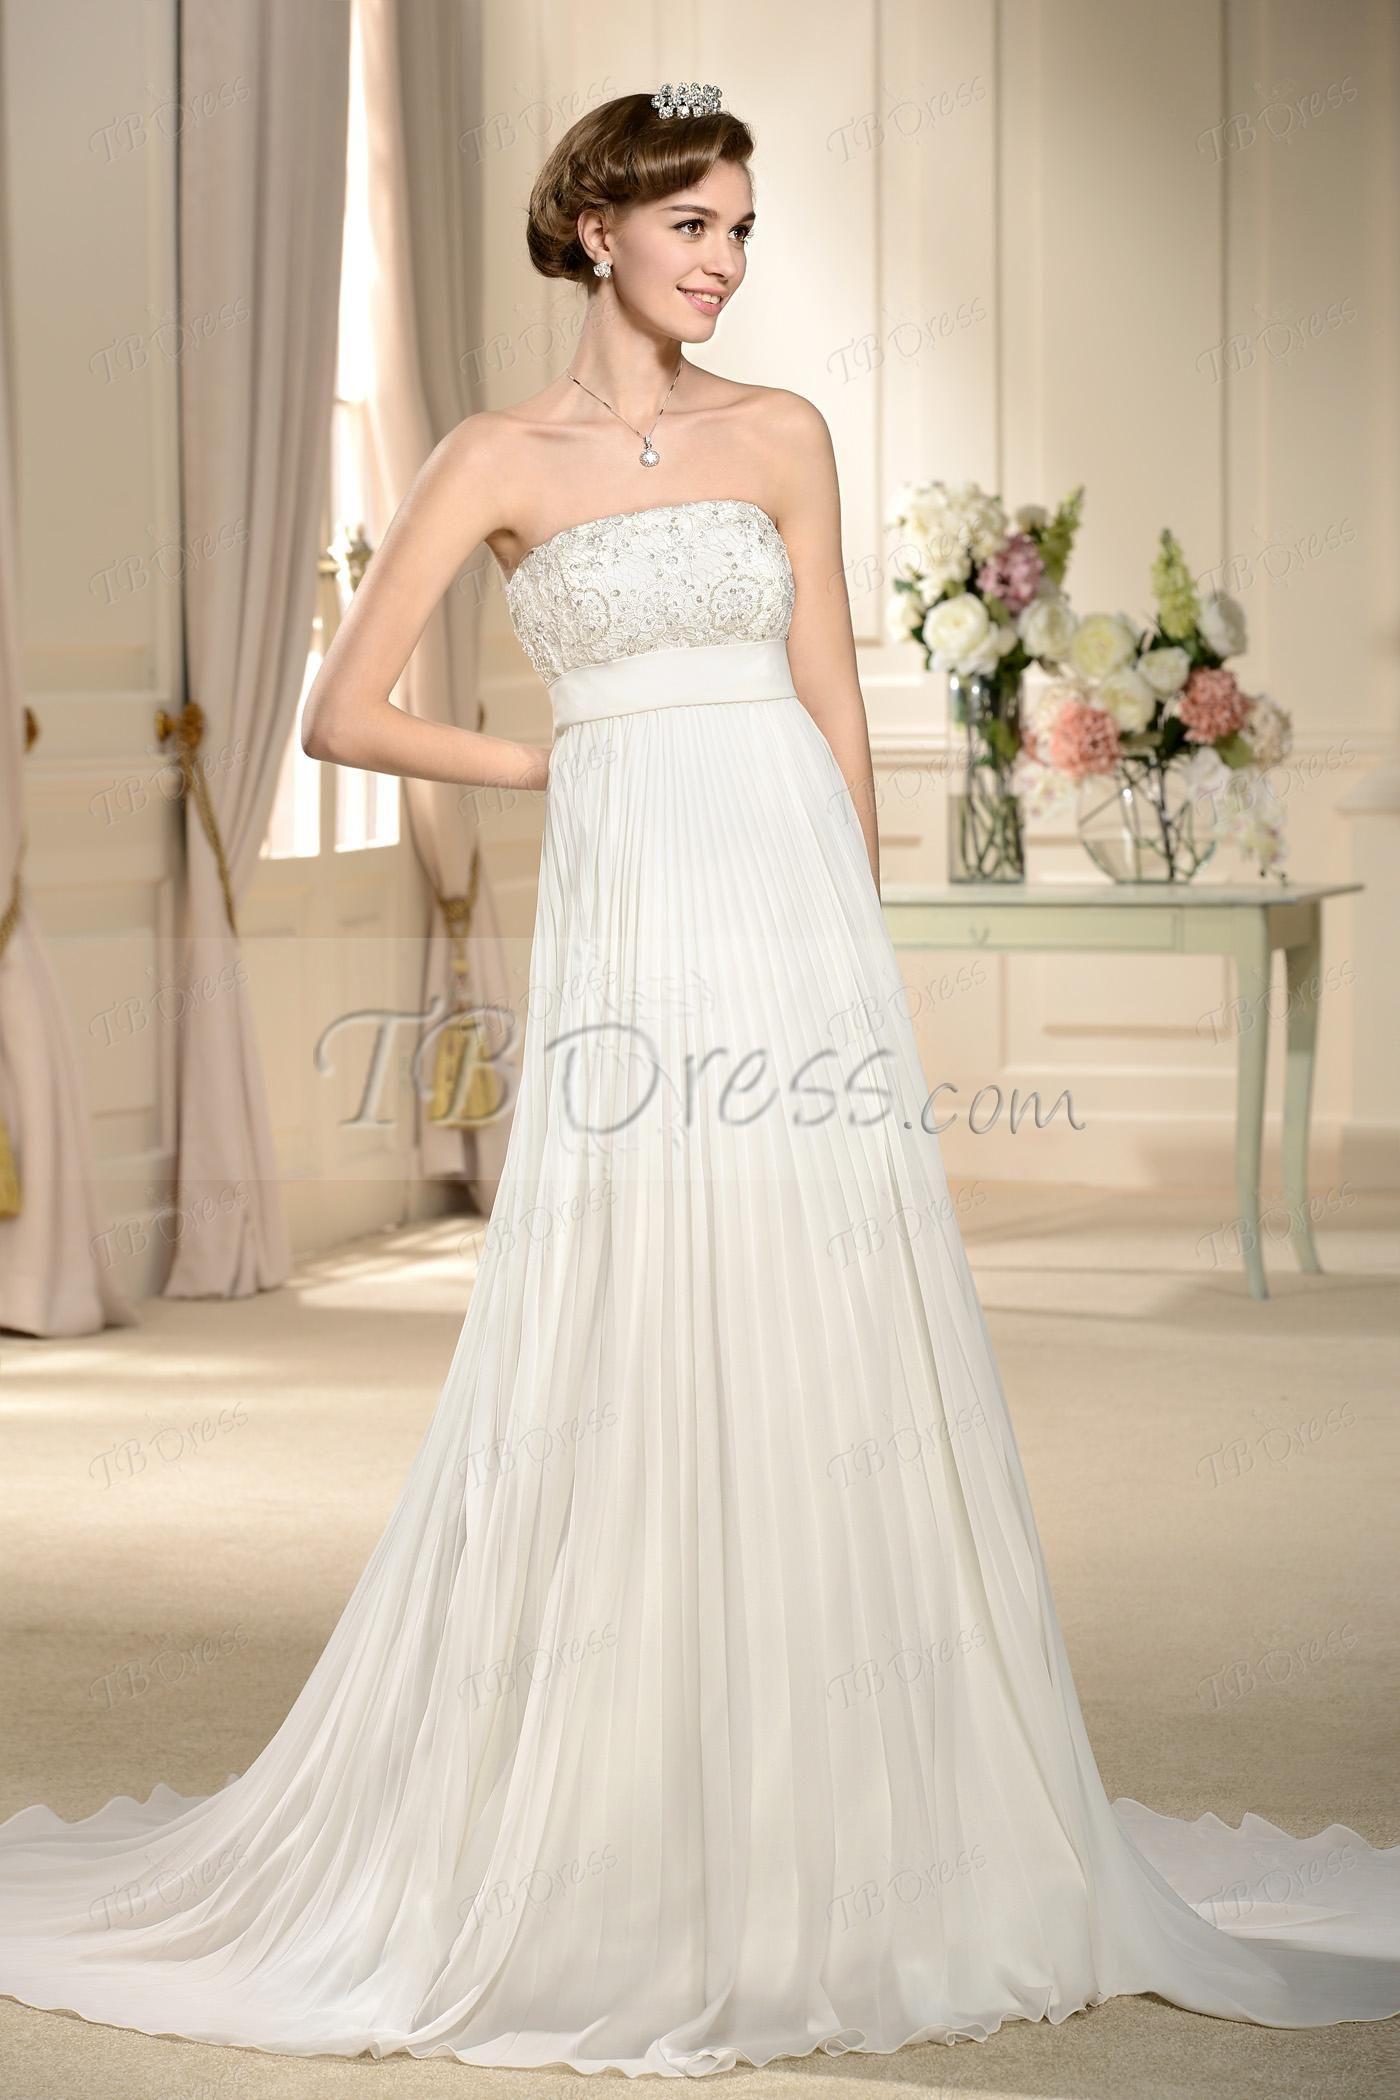 Empire waist aline draped strapless court train wedding dress